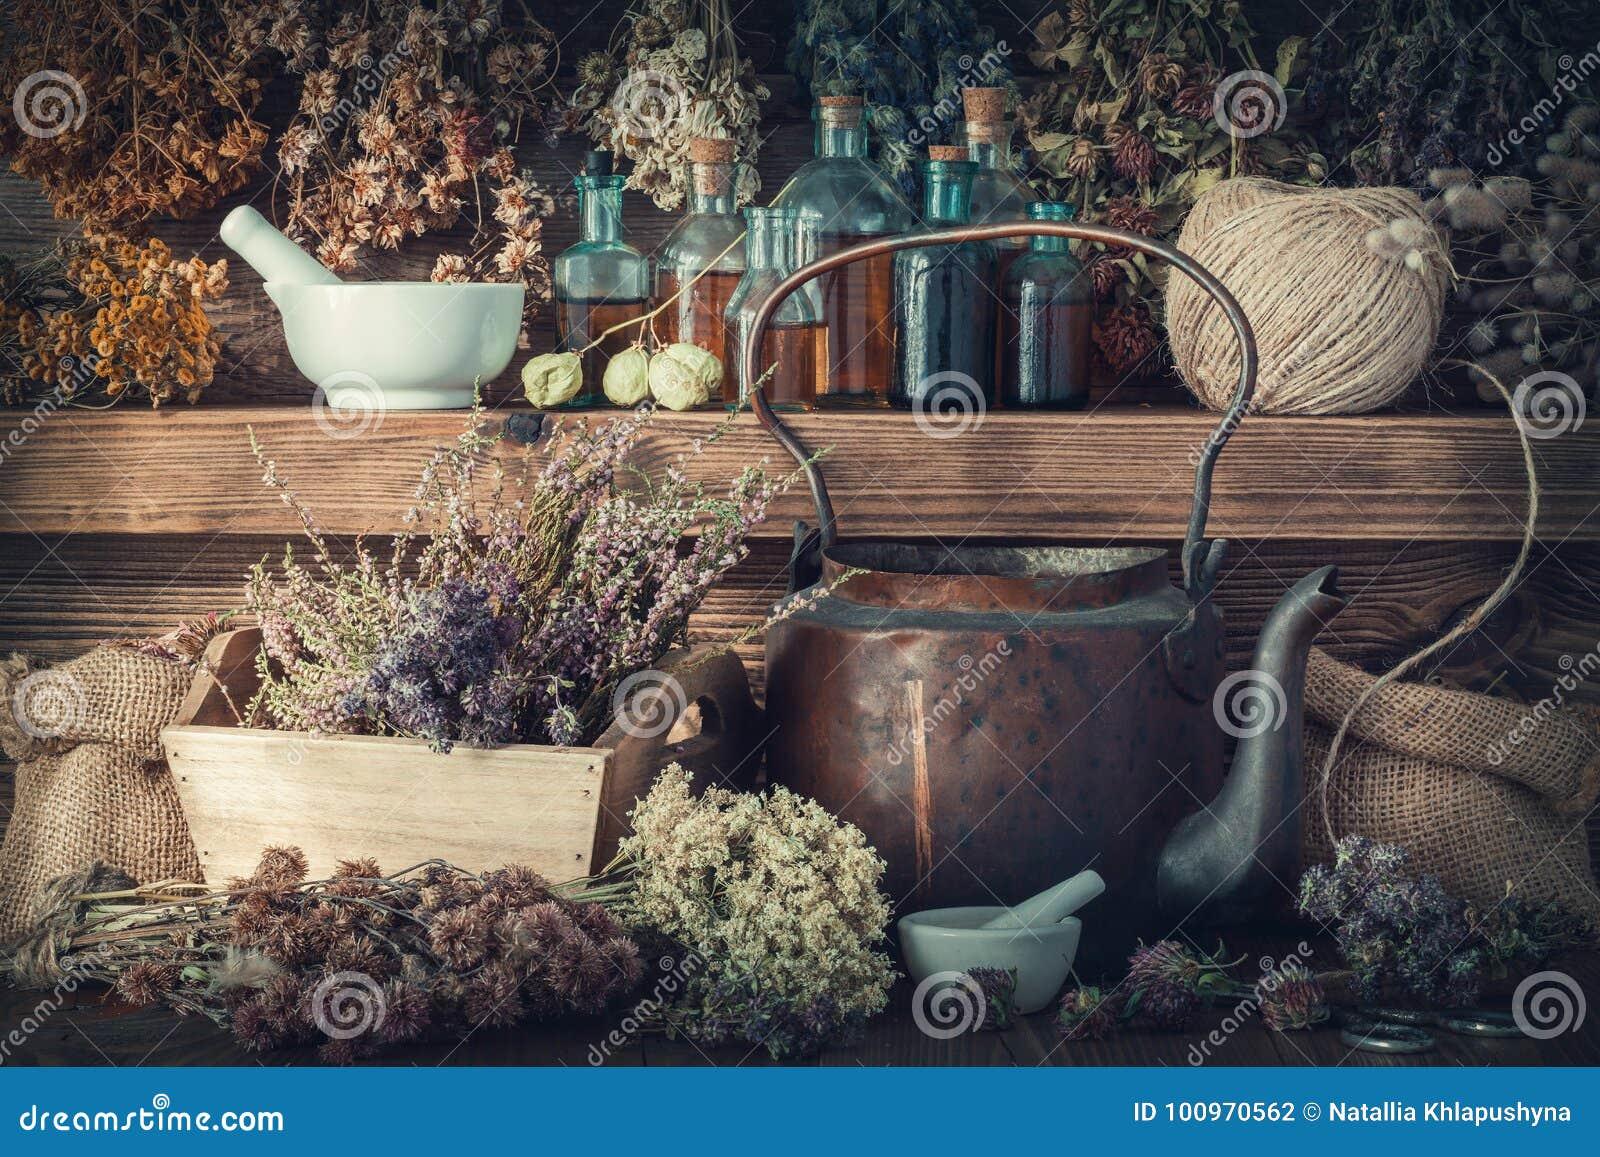 Tincture μπουκάλια, υγιή χορτάρια, κονίαμα, θεραπευτικά φάρμακα, παλαιά κατσαρόλα τσαγιού στο ξύλινο ράφι